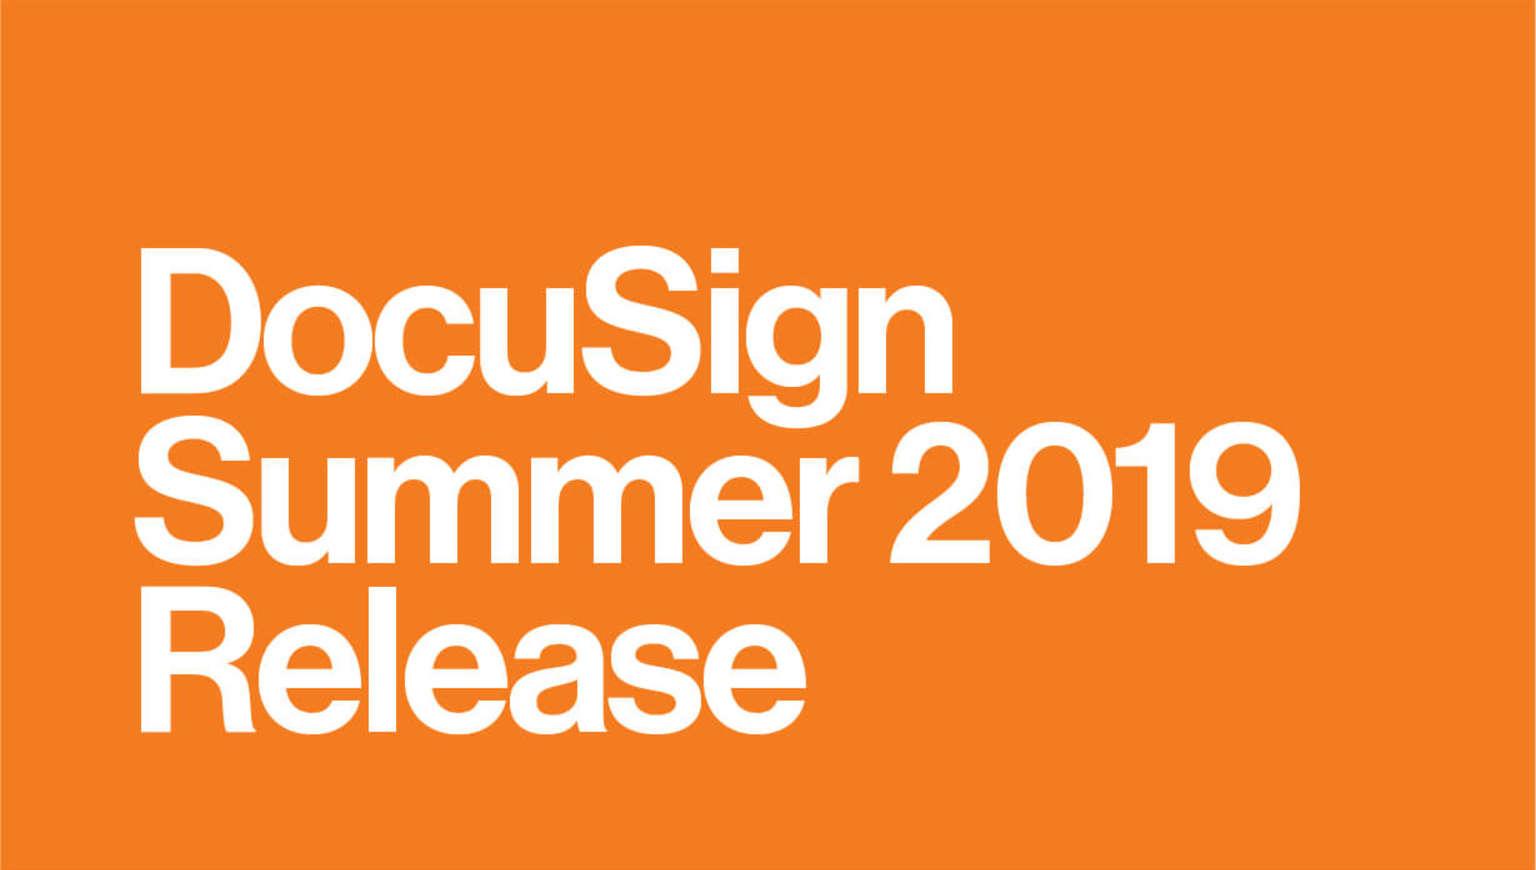 DocuSign Summer Release 2019